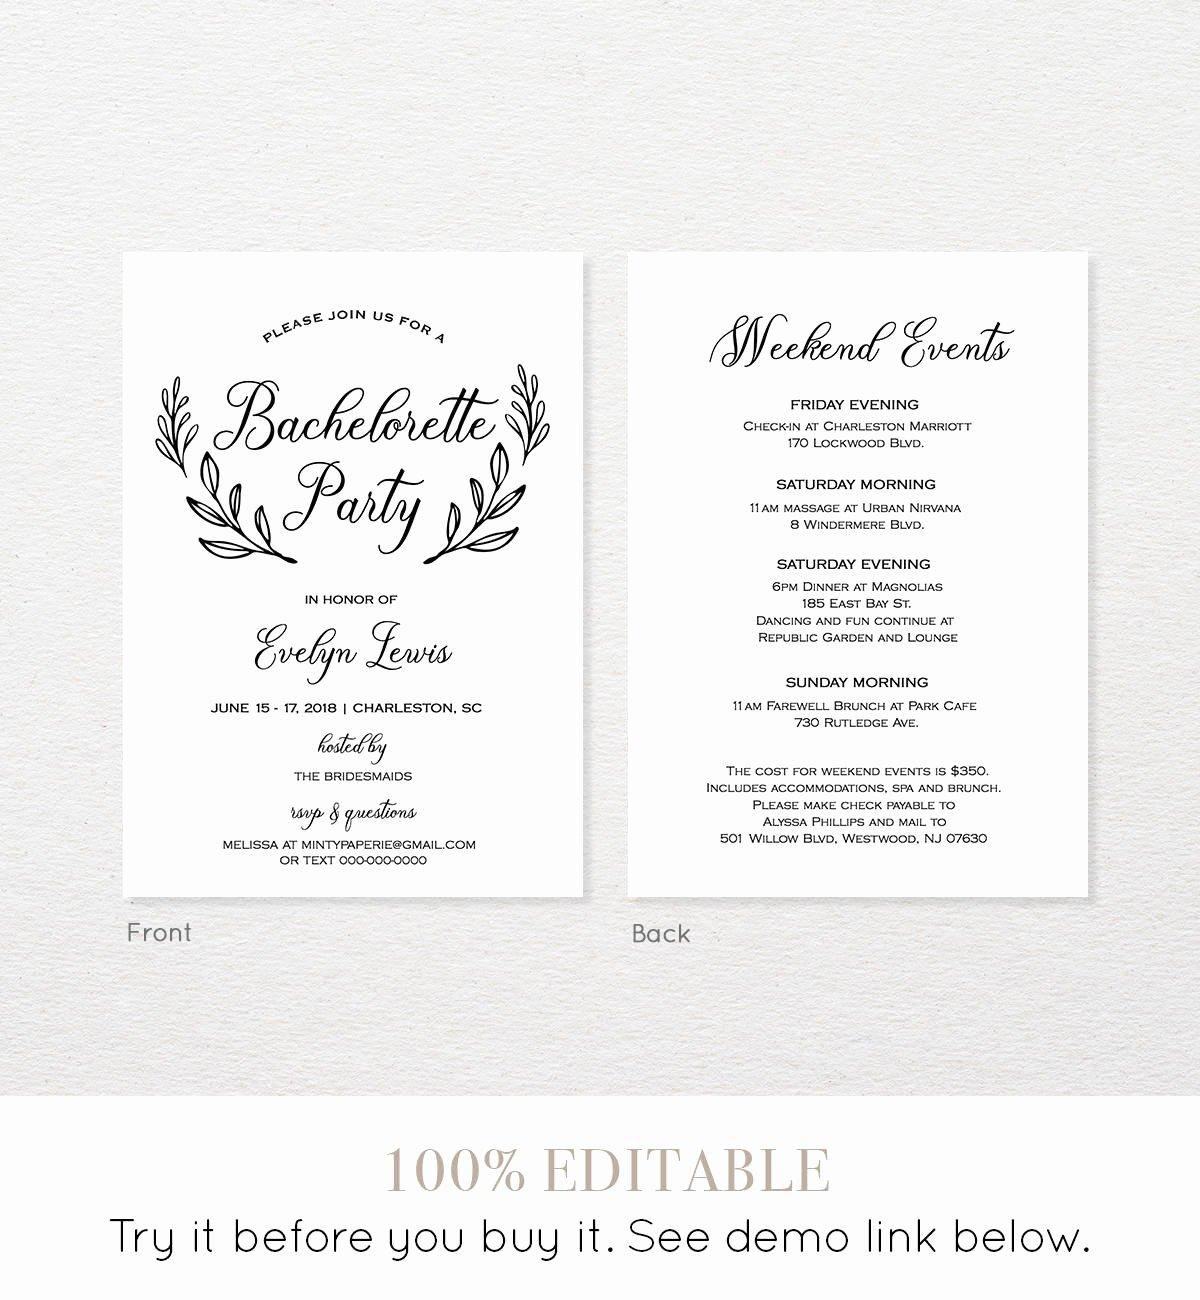 Bachelorette Party Agenda Template New Bachelorette Party Invitation Template Printable